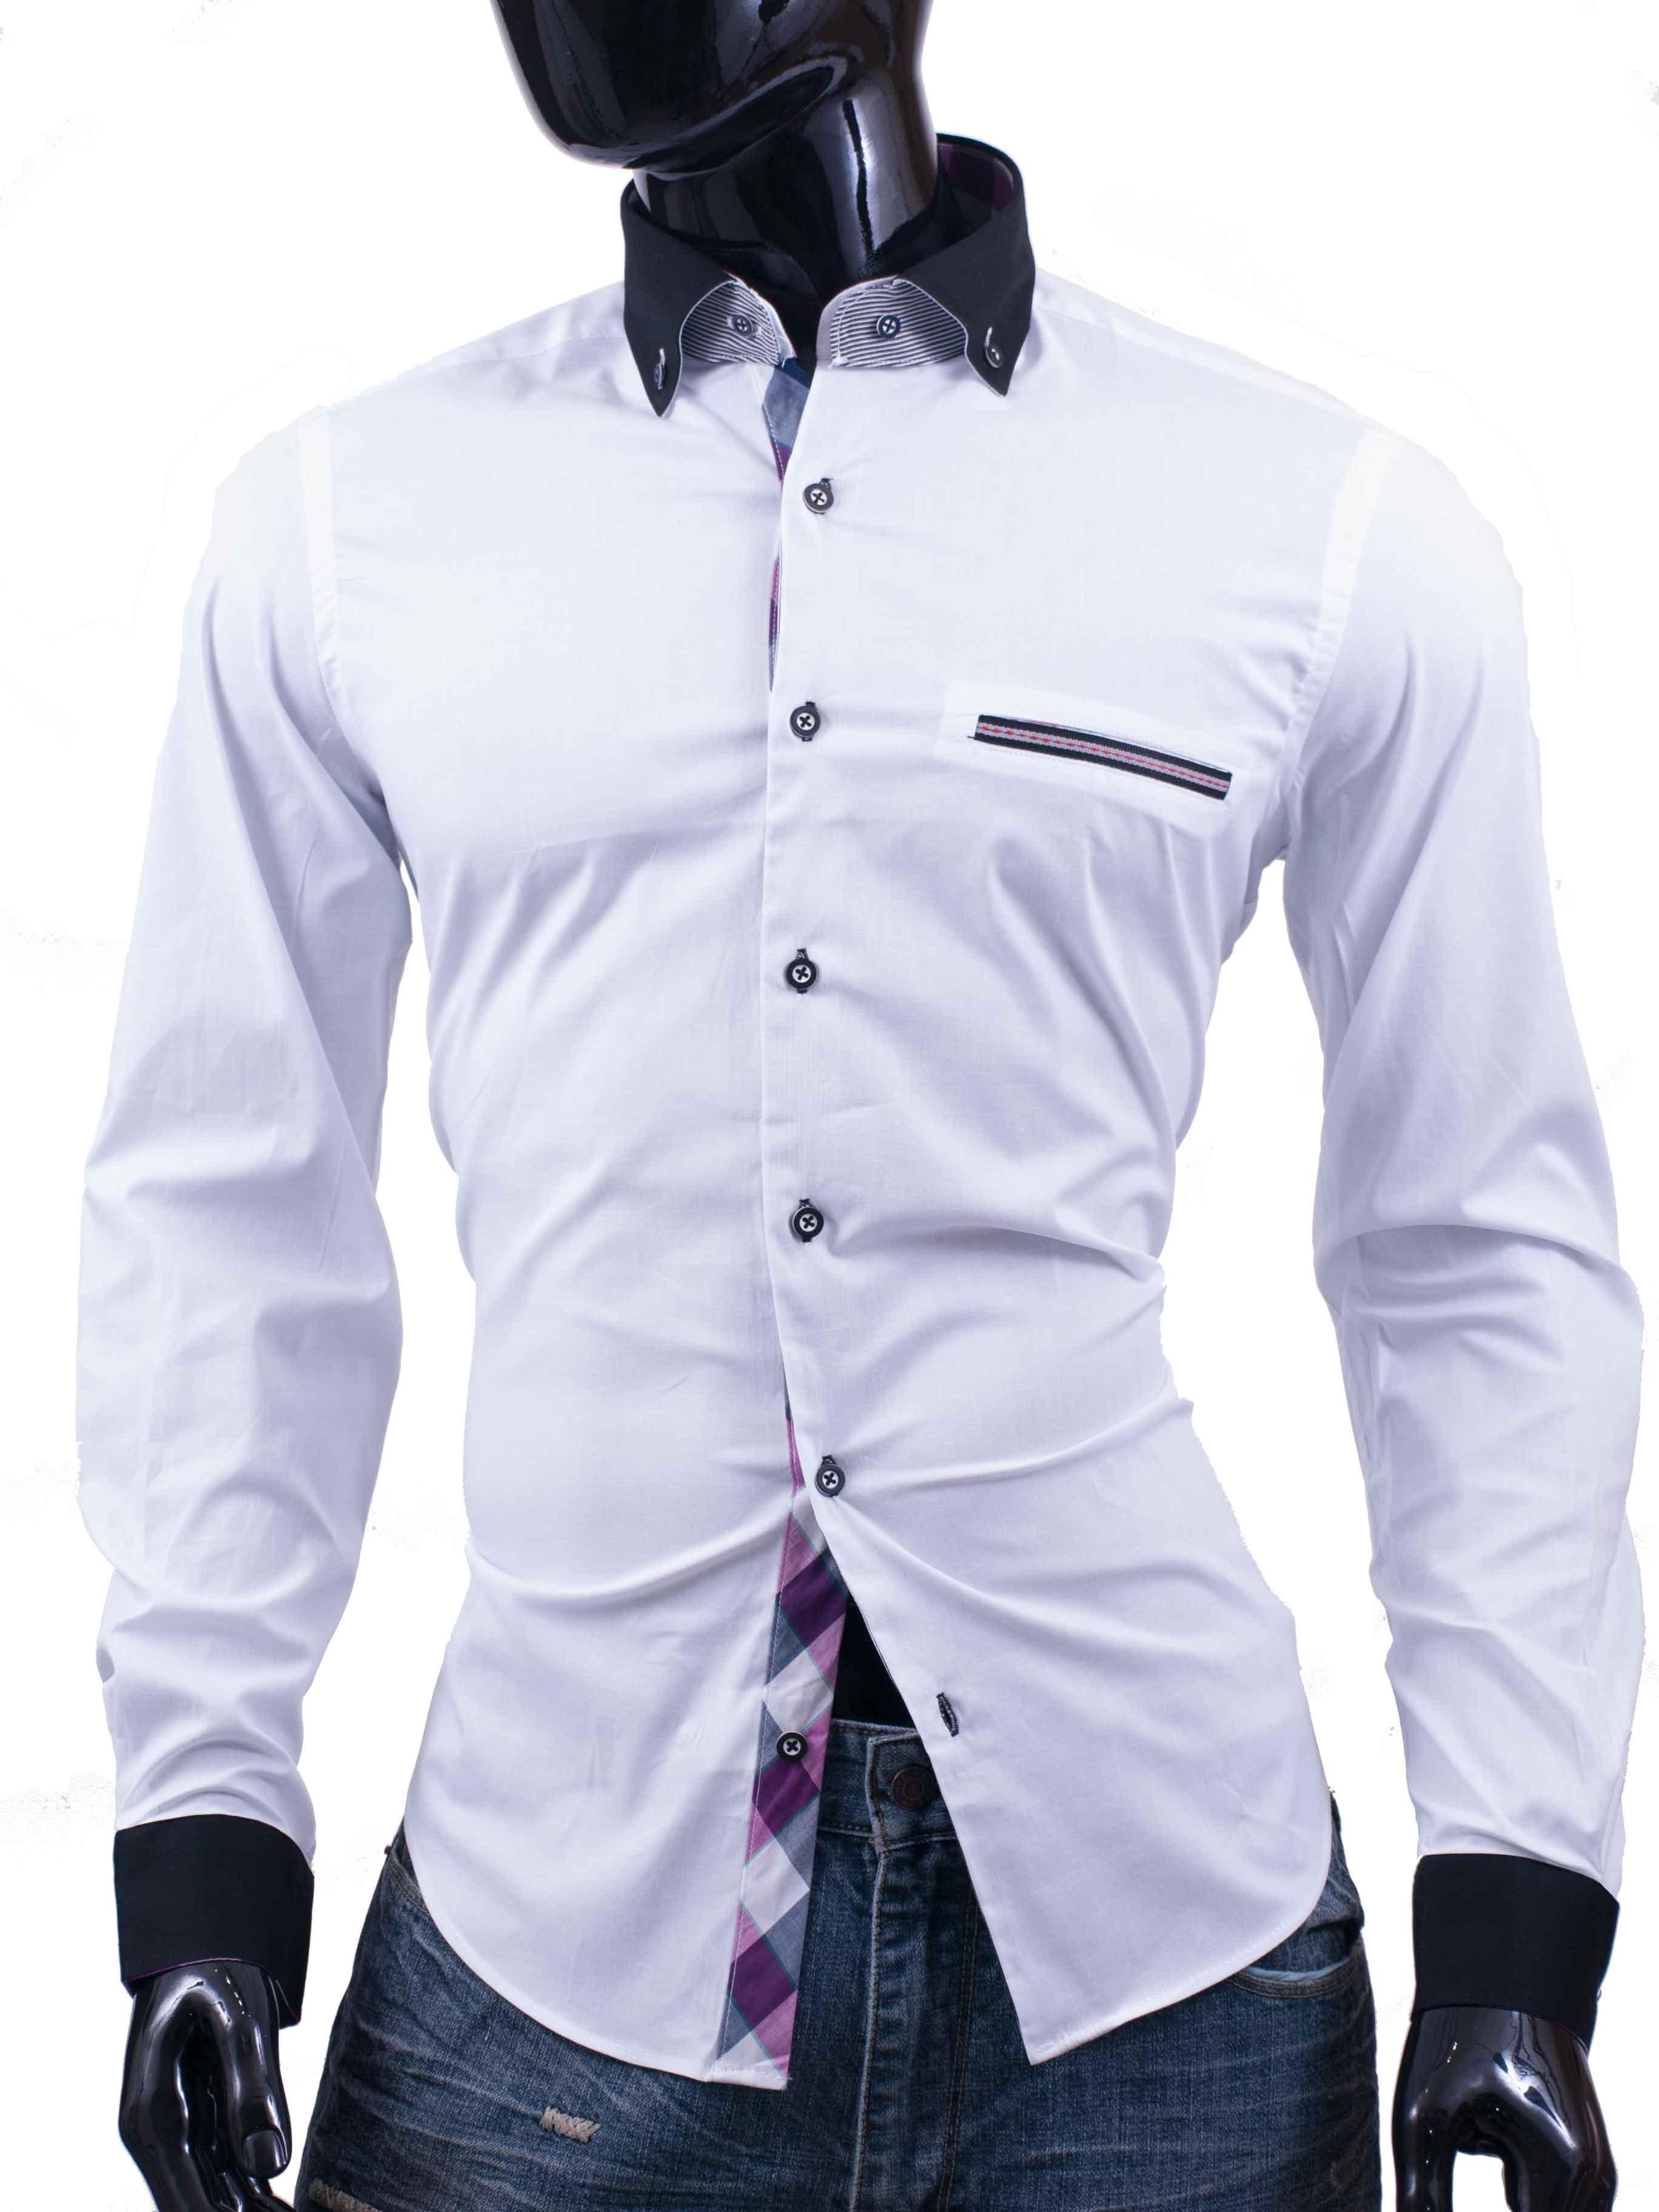 Košile Bragga Hill bílá s černým límečkem